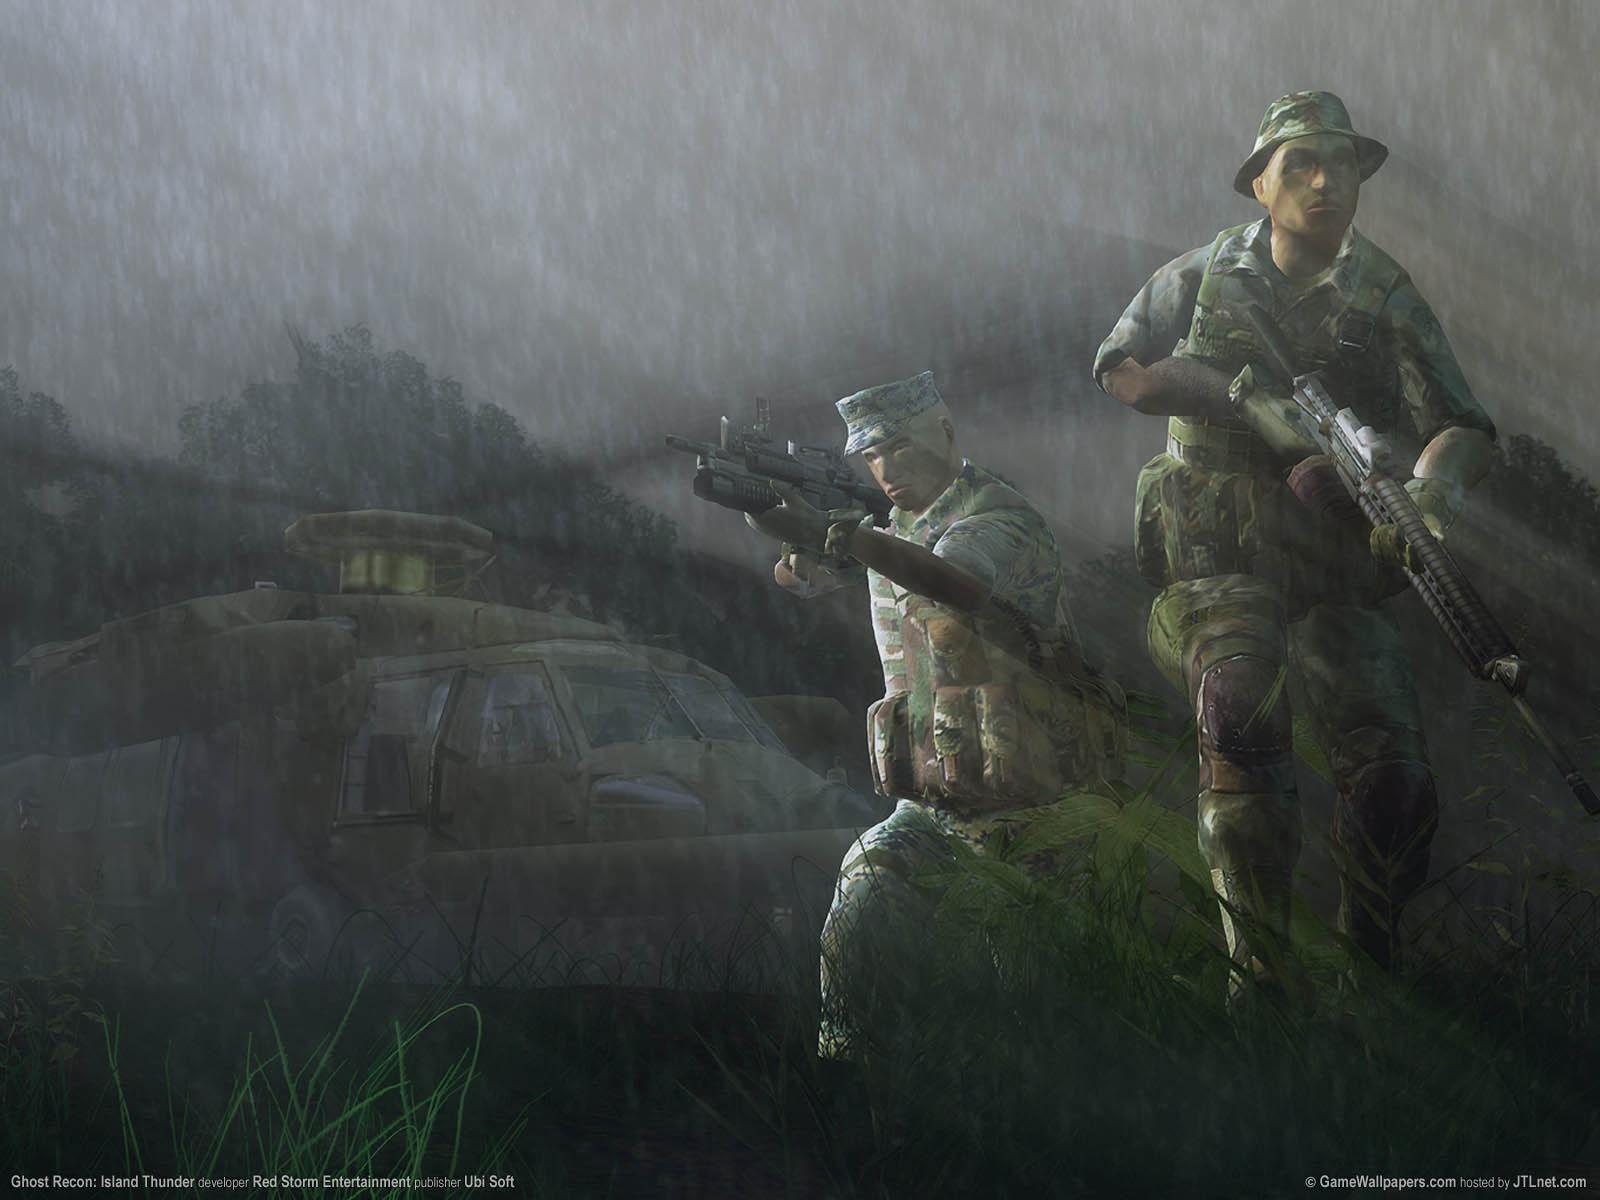 Ghost Recon: Island Thunderνmmer=03 Hintergrundbild  1600x1200